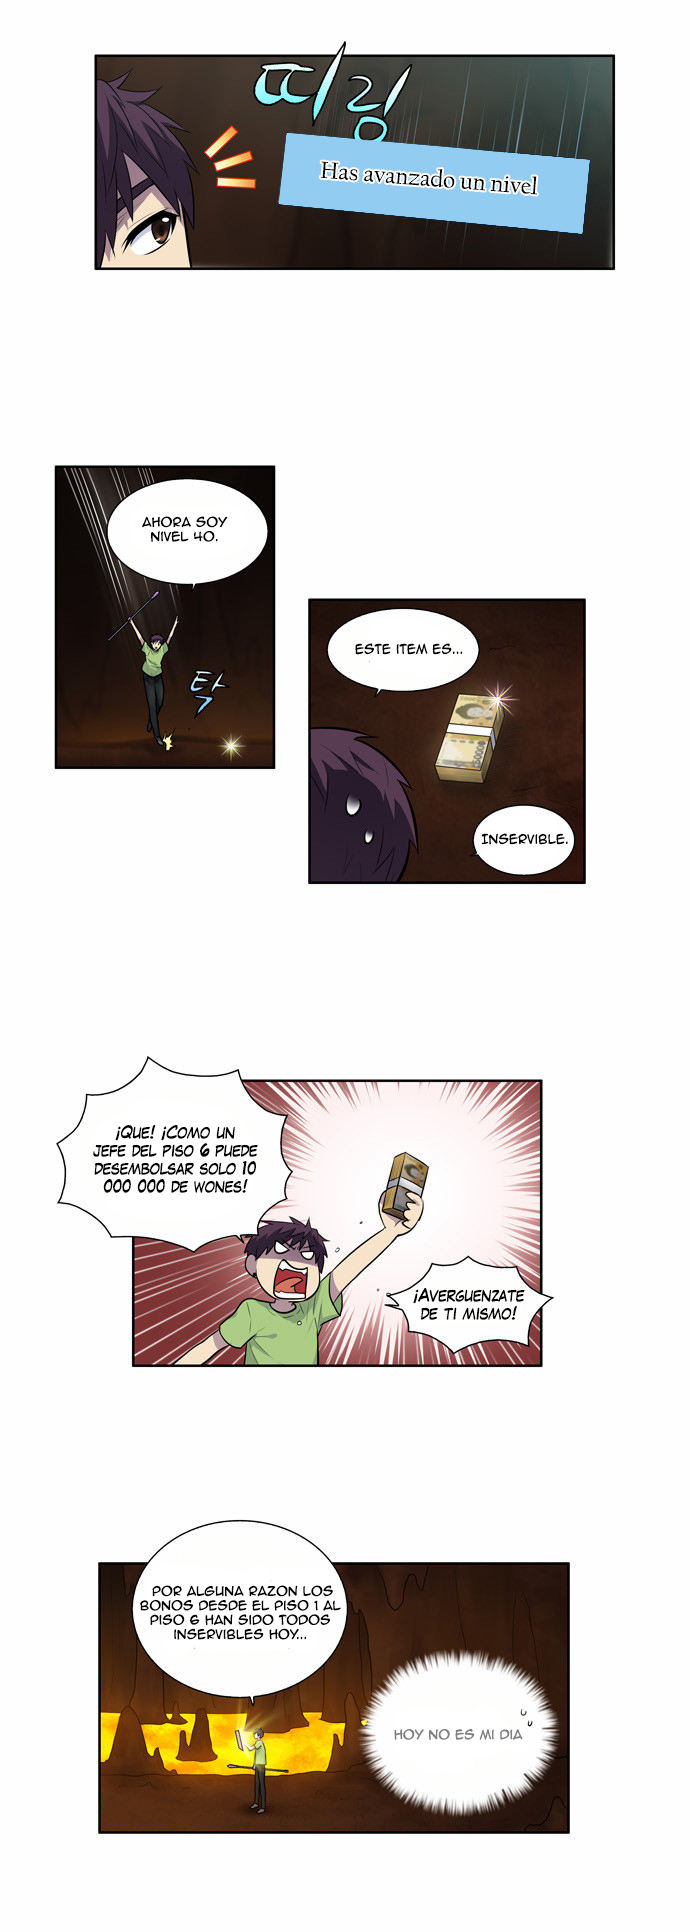 http://c5.ninemanga.com/es_manga/61/1725/429548/d24fb9e15b6e0464c336856ec4c69cc0.jpg Page 4